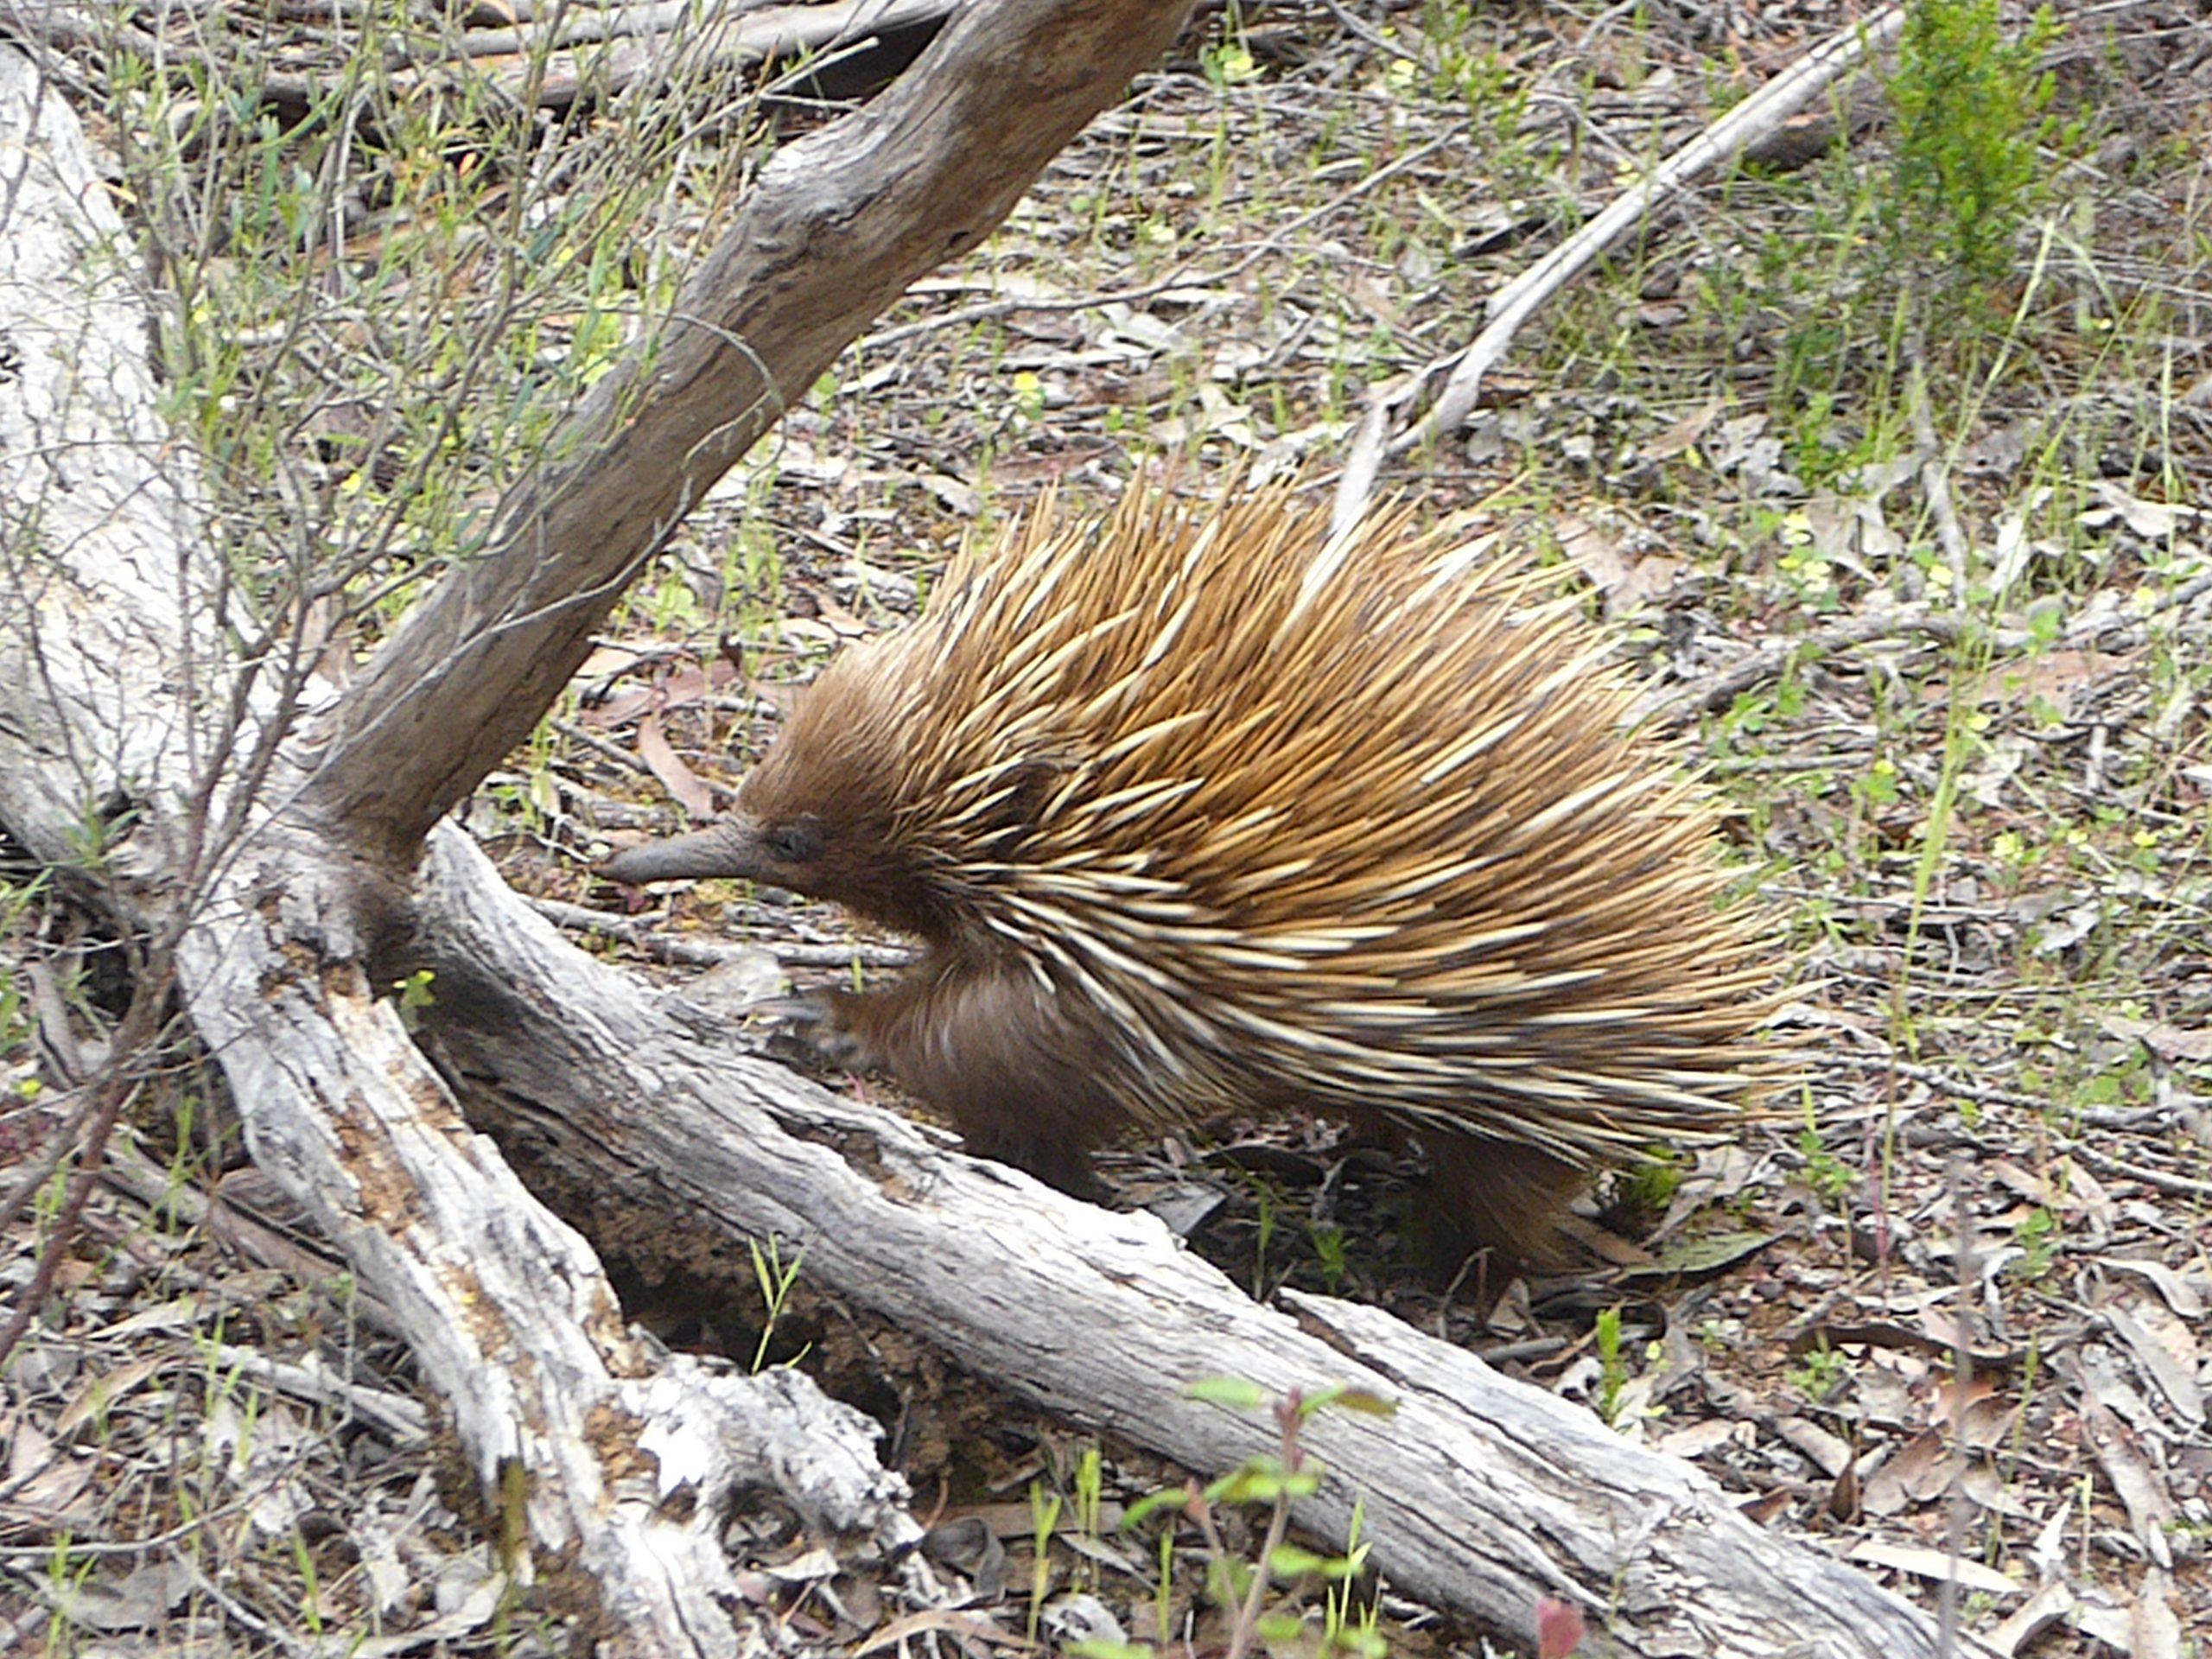 Radreise Australien 2016 - Kangaroo Island - Ameisenigel (Tachyglossidae)